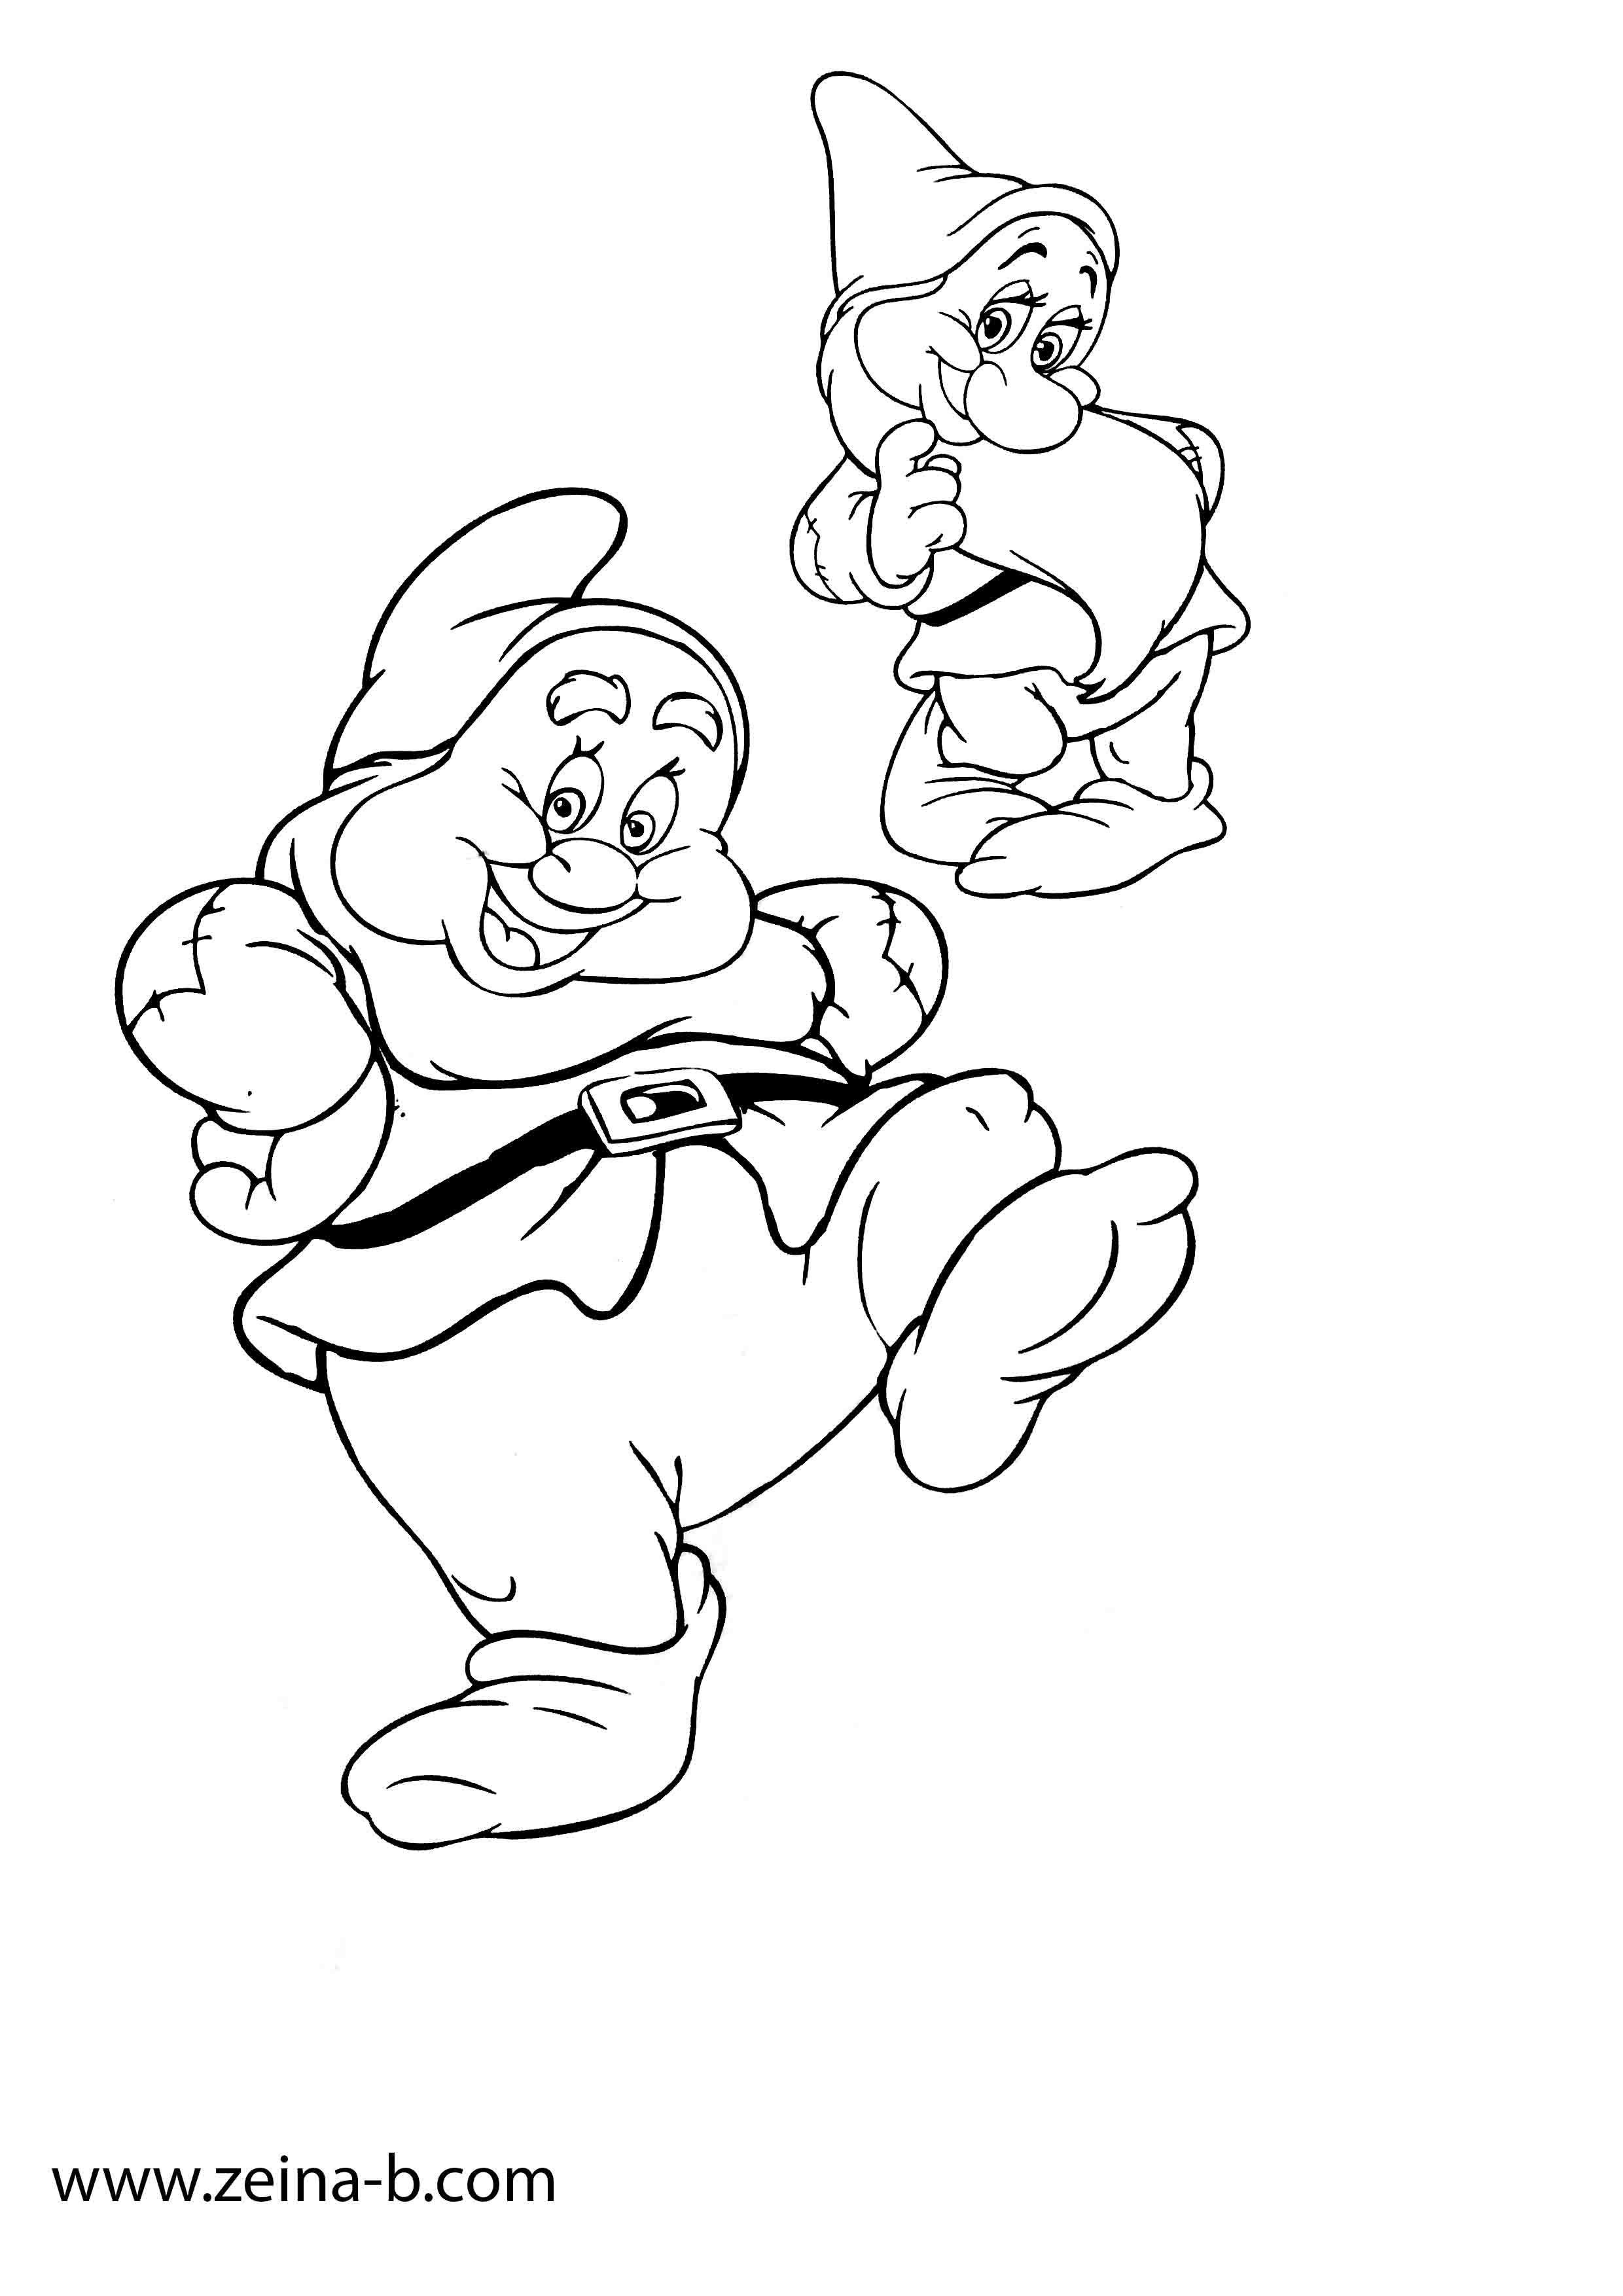 صور رسومات للتلوين للأطفال Art Fictional Characters Print